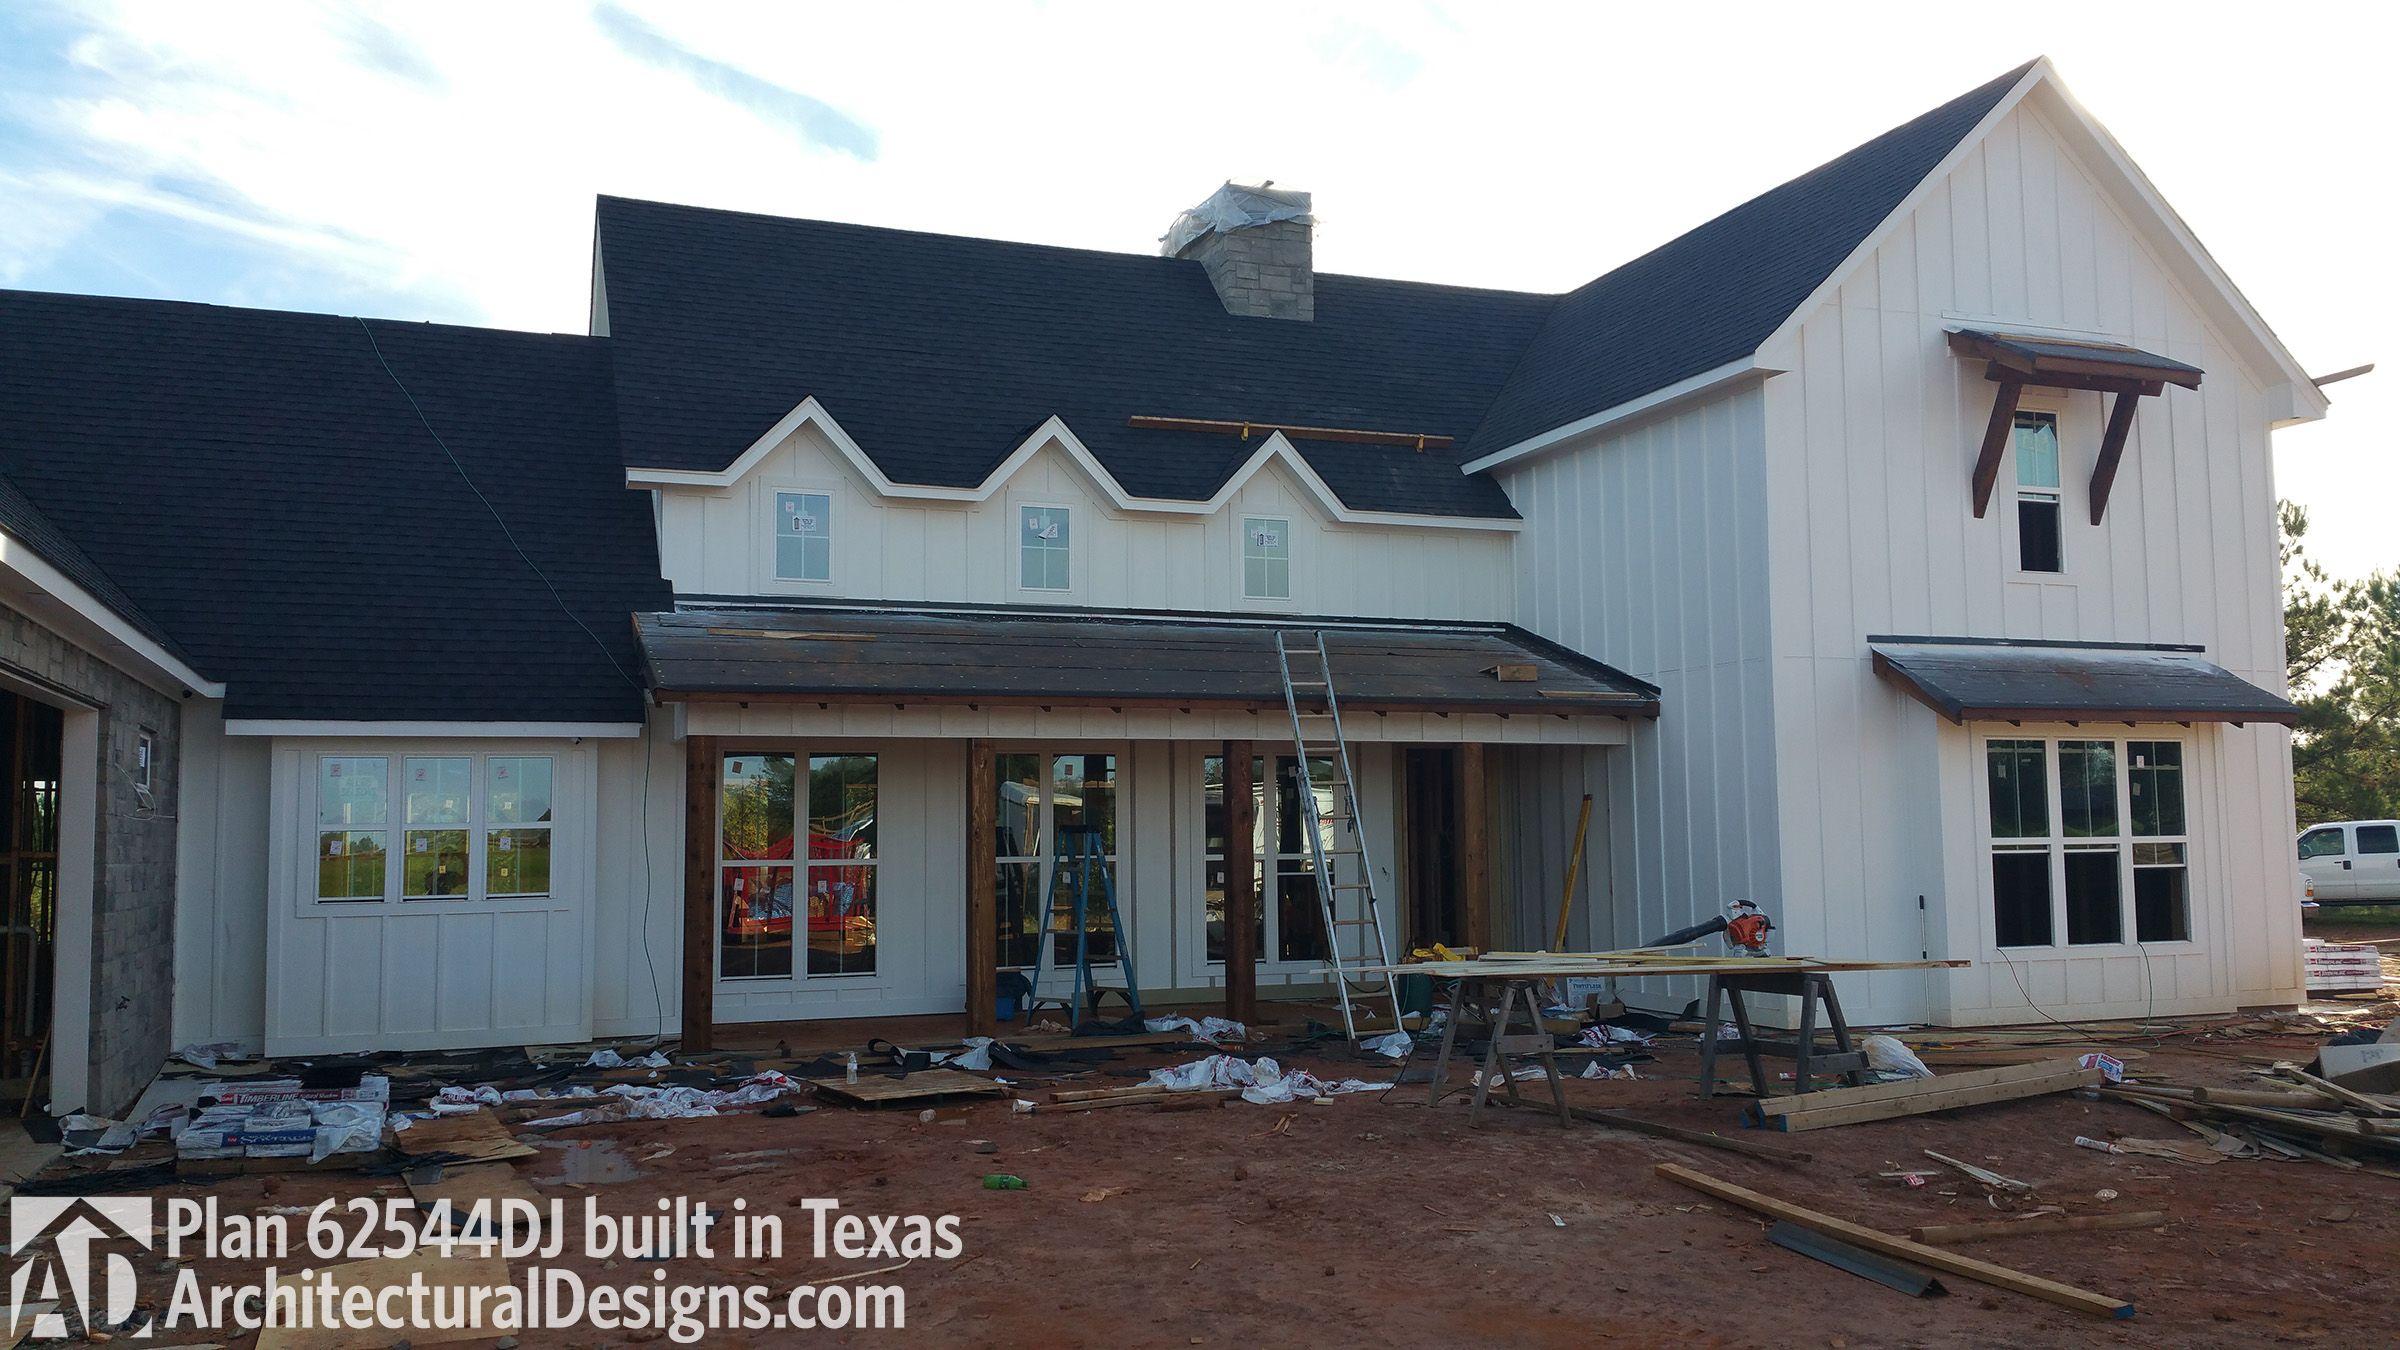 cottage plans for building. Modern 4 Bed Farmhouse Plan  62544DJ Cottage Photo Gallery Bedroom plans